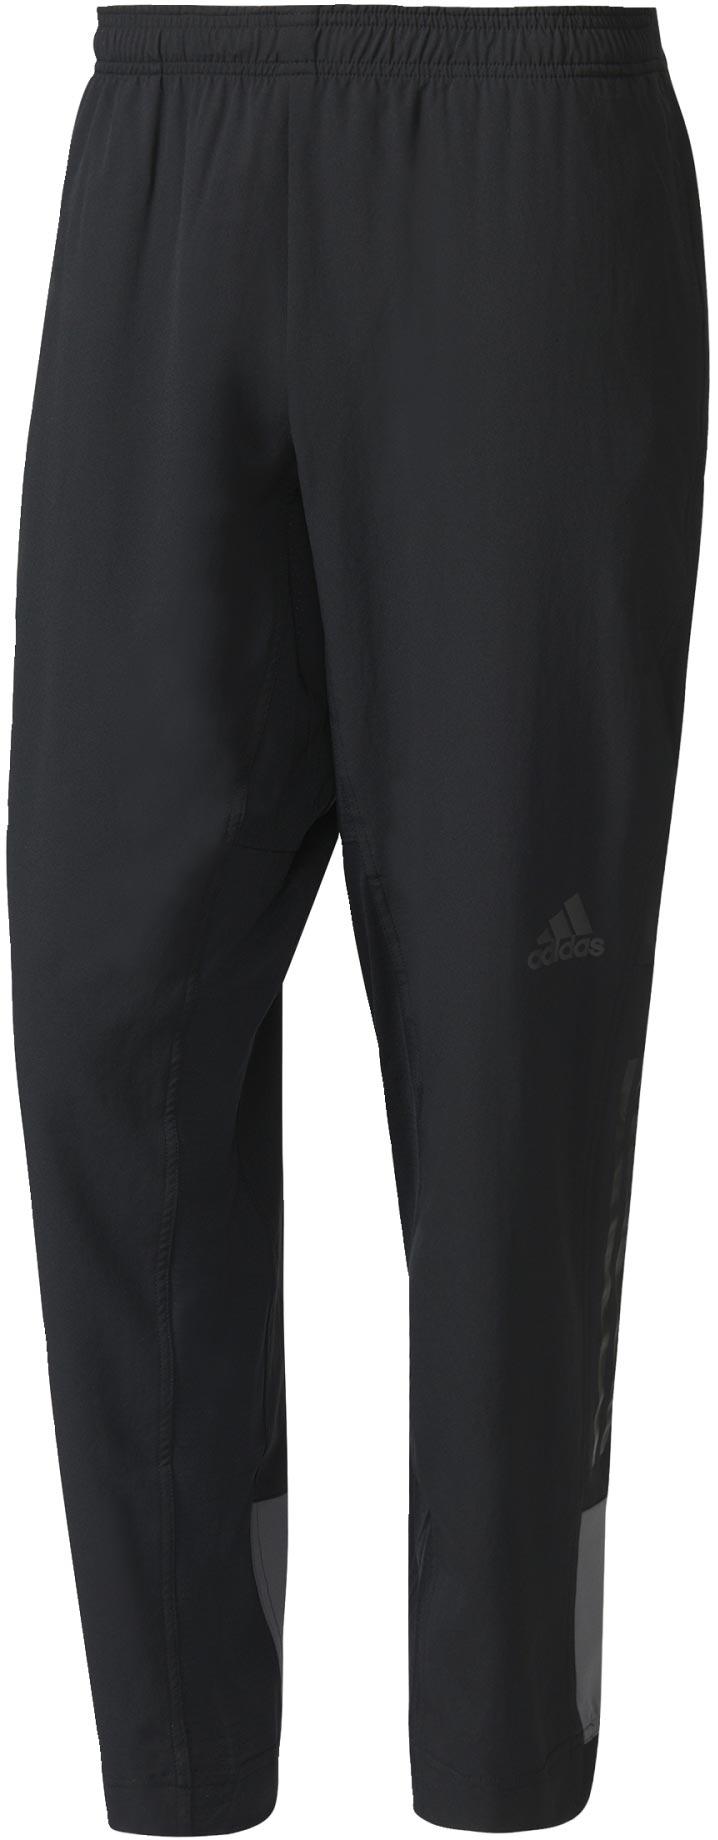 online store 0d4a4 2af48 adidas WORKOUT PANT CLIMACOOL WV | sportisimo.com